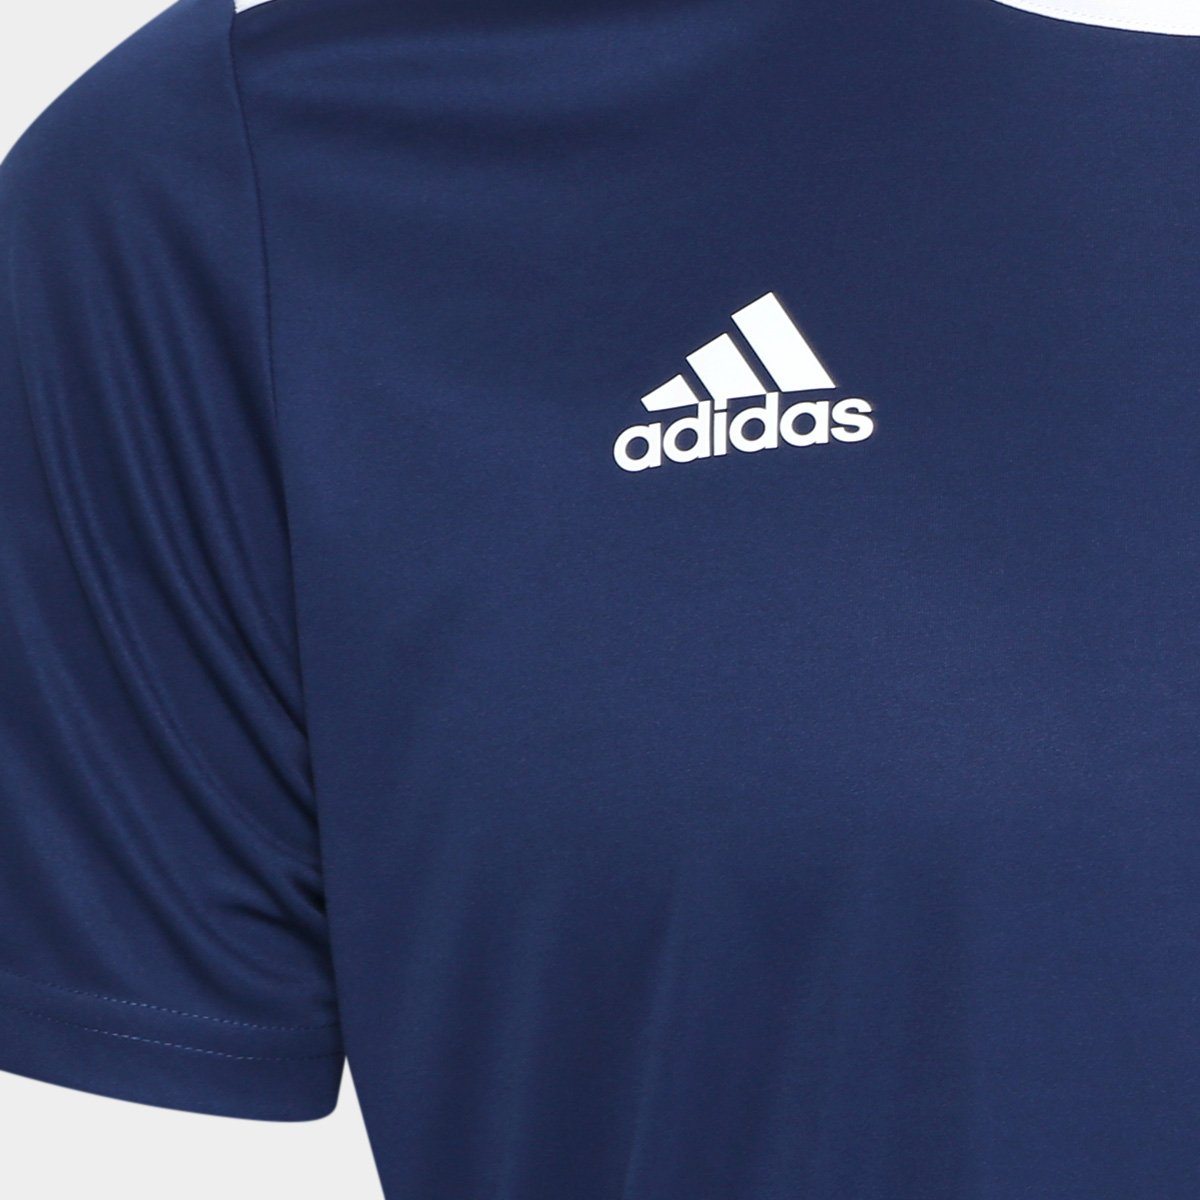 Camiseta Adidas Entrada 18 Masculina - Tam: P - 2